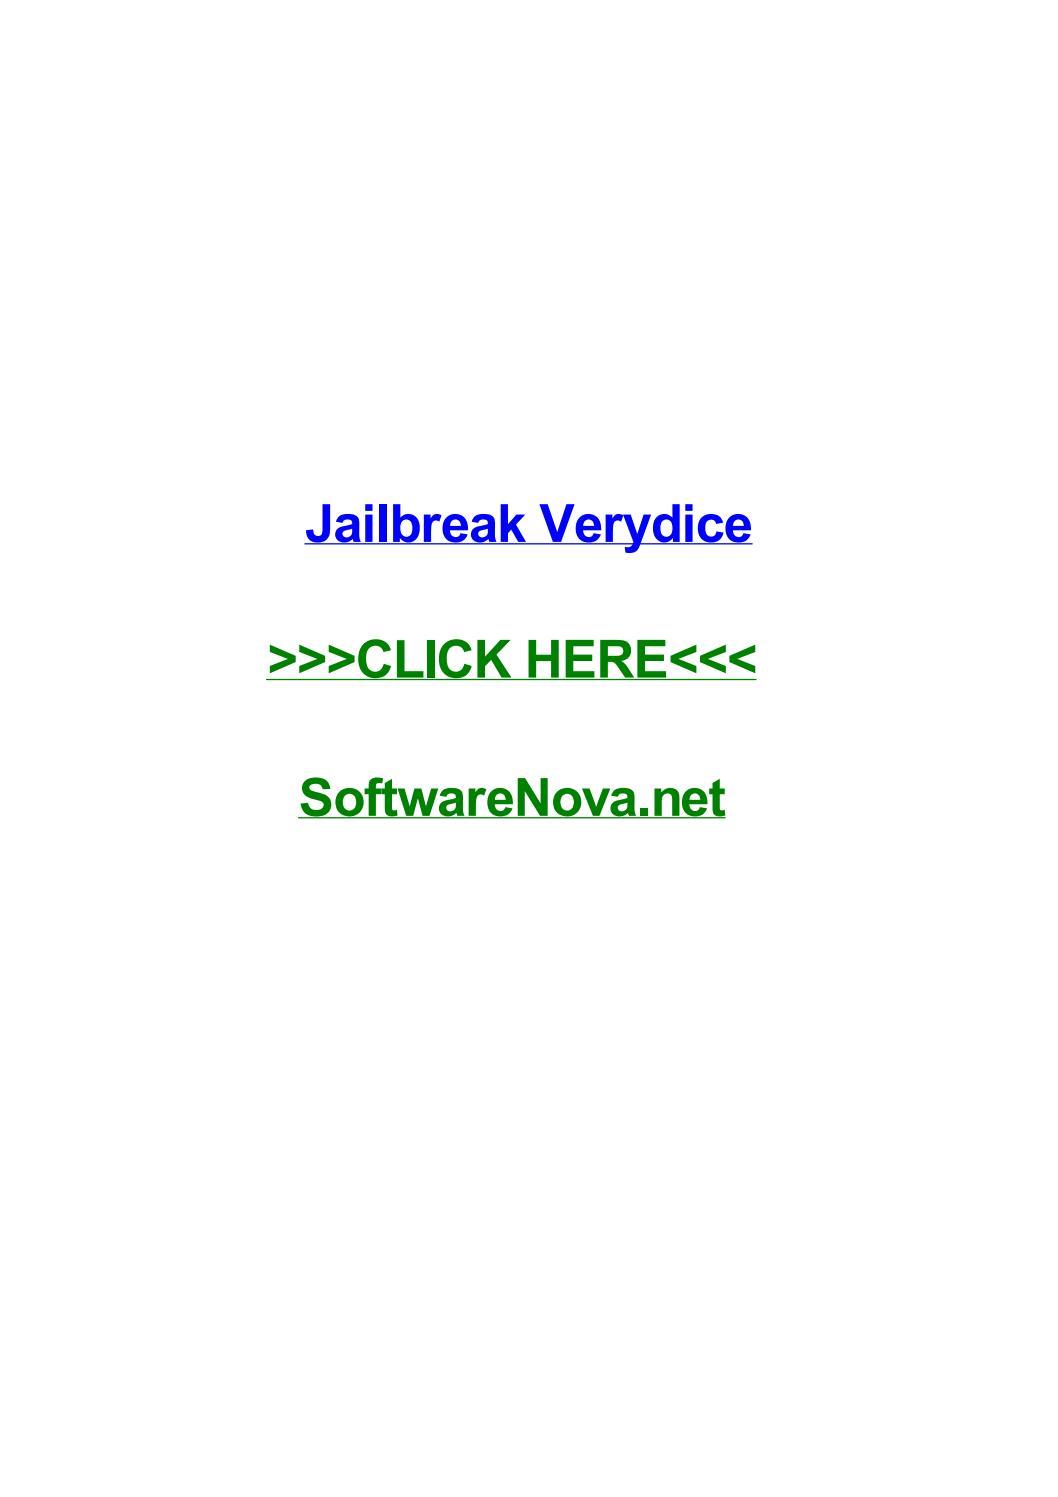 Jailbreak verydice by devinamrj - issuu